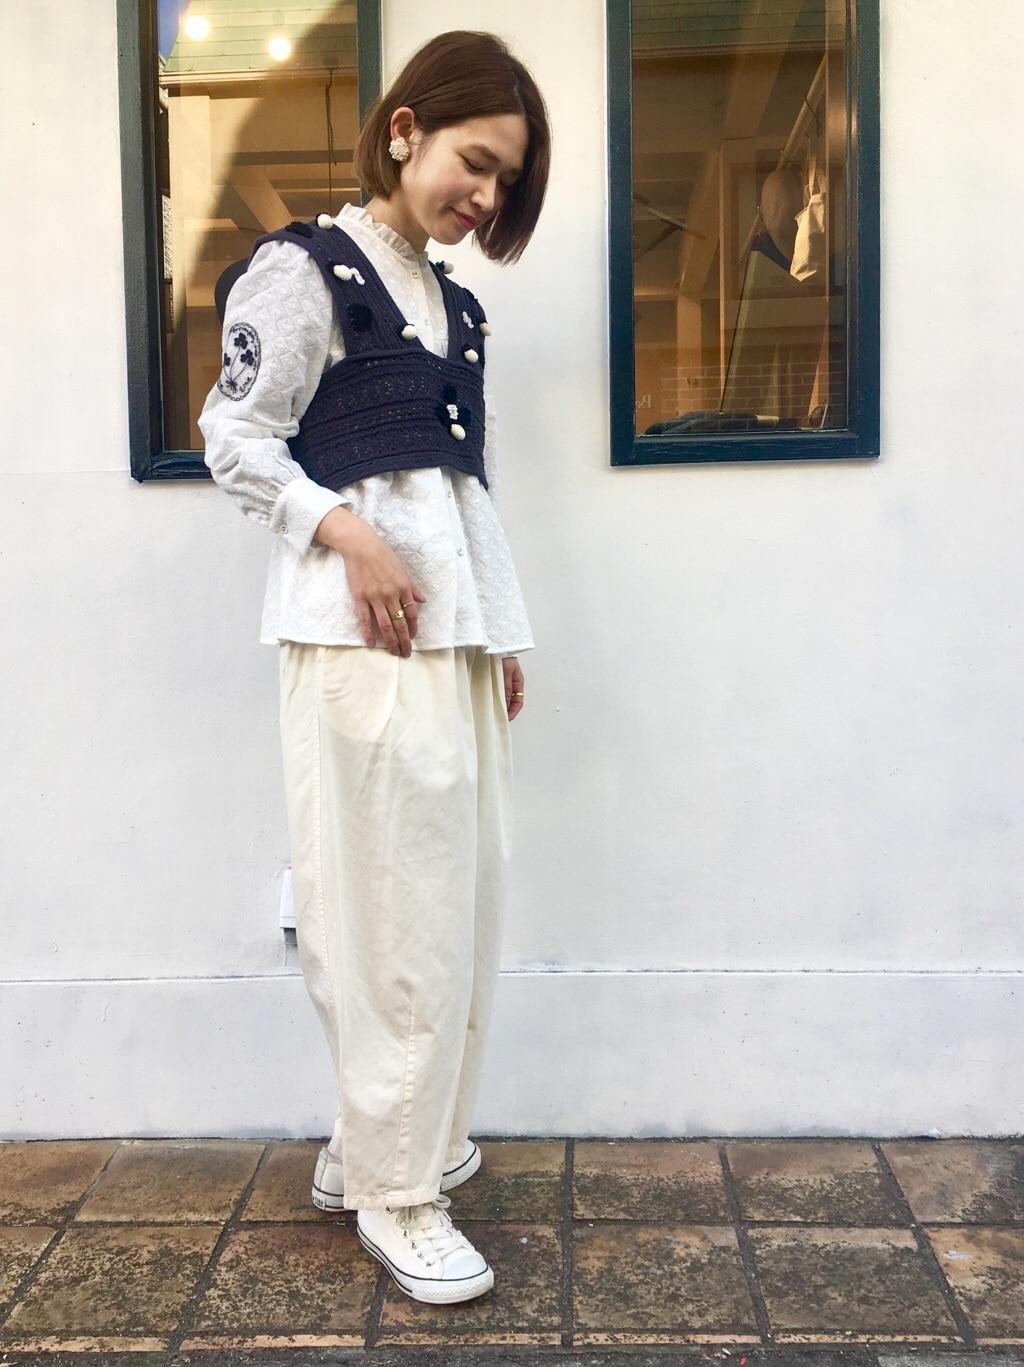 chambre de charme 横浜ジョイナス 身長:160cm 2021.01.05